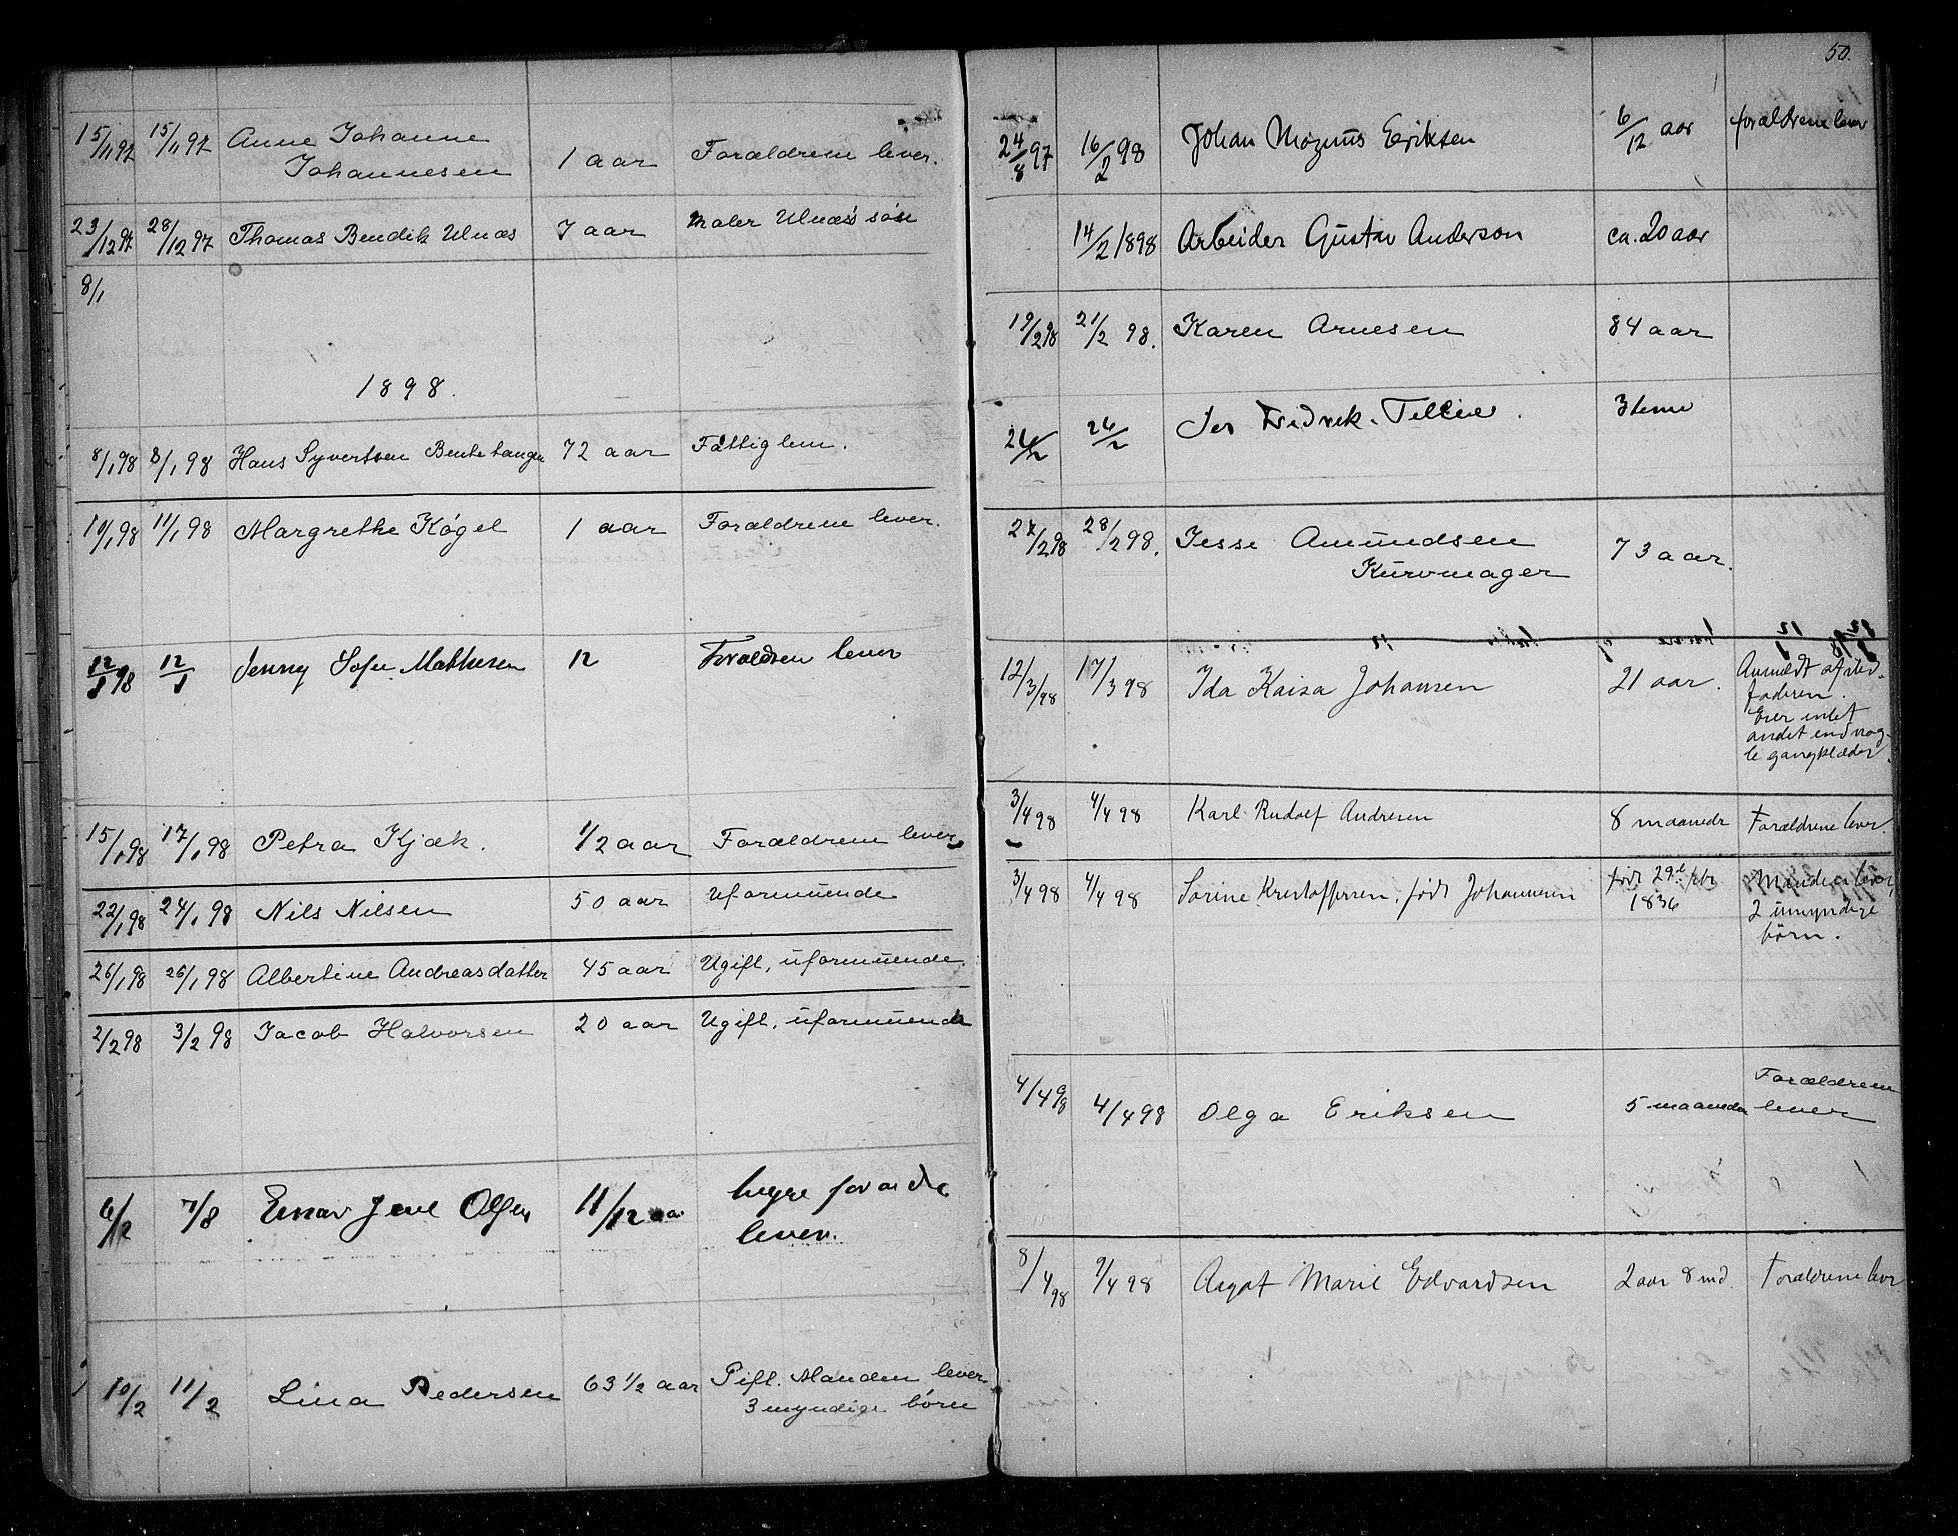 SAO, Sarpsborg byfogd, H/Ha/Haa/L0001: Dødsfallsprotokoll, 1880-1904, s. 49b-50a